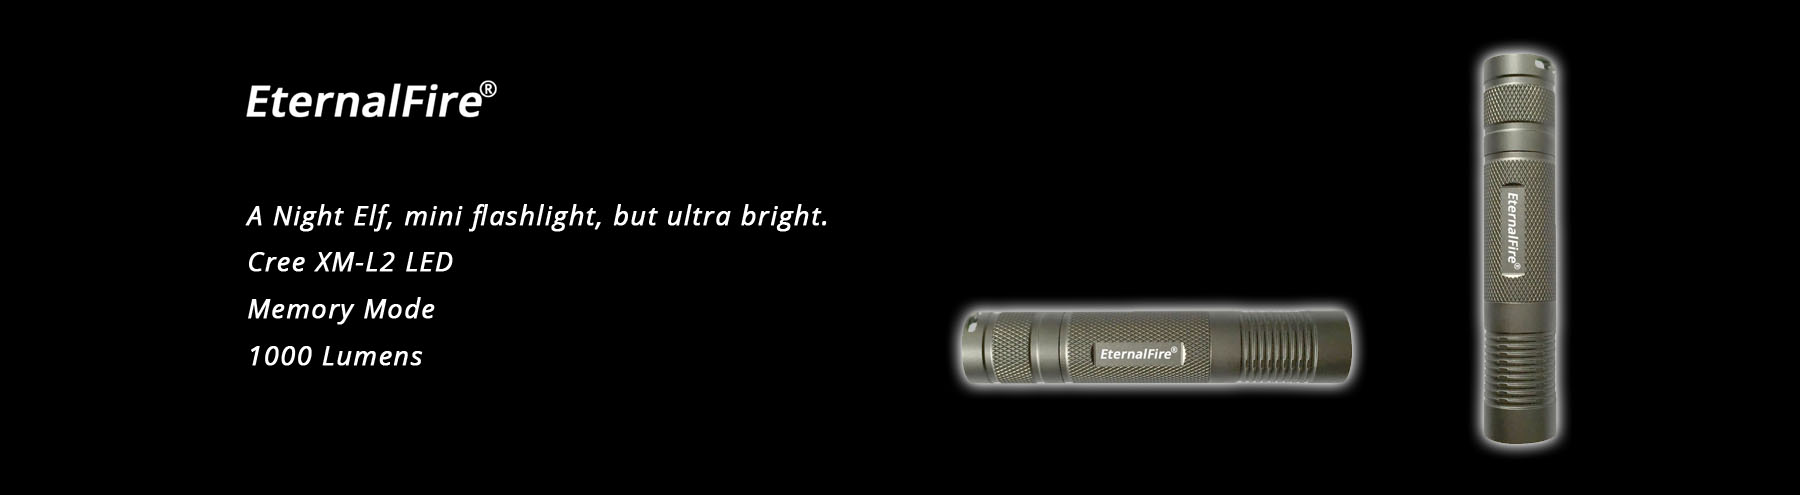 EternalFire E05 led flashlight